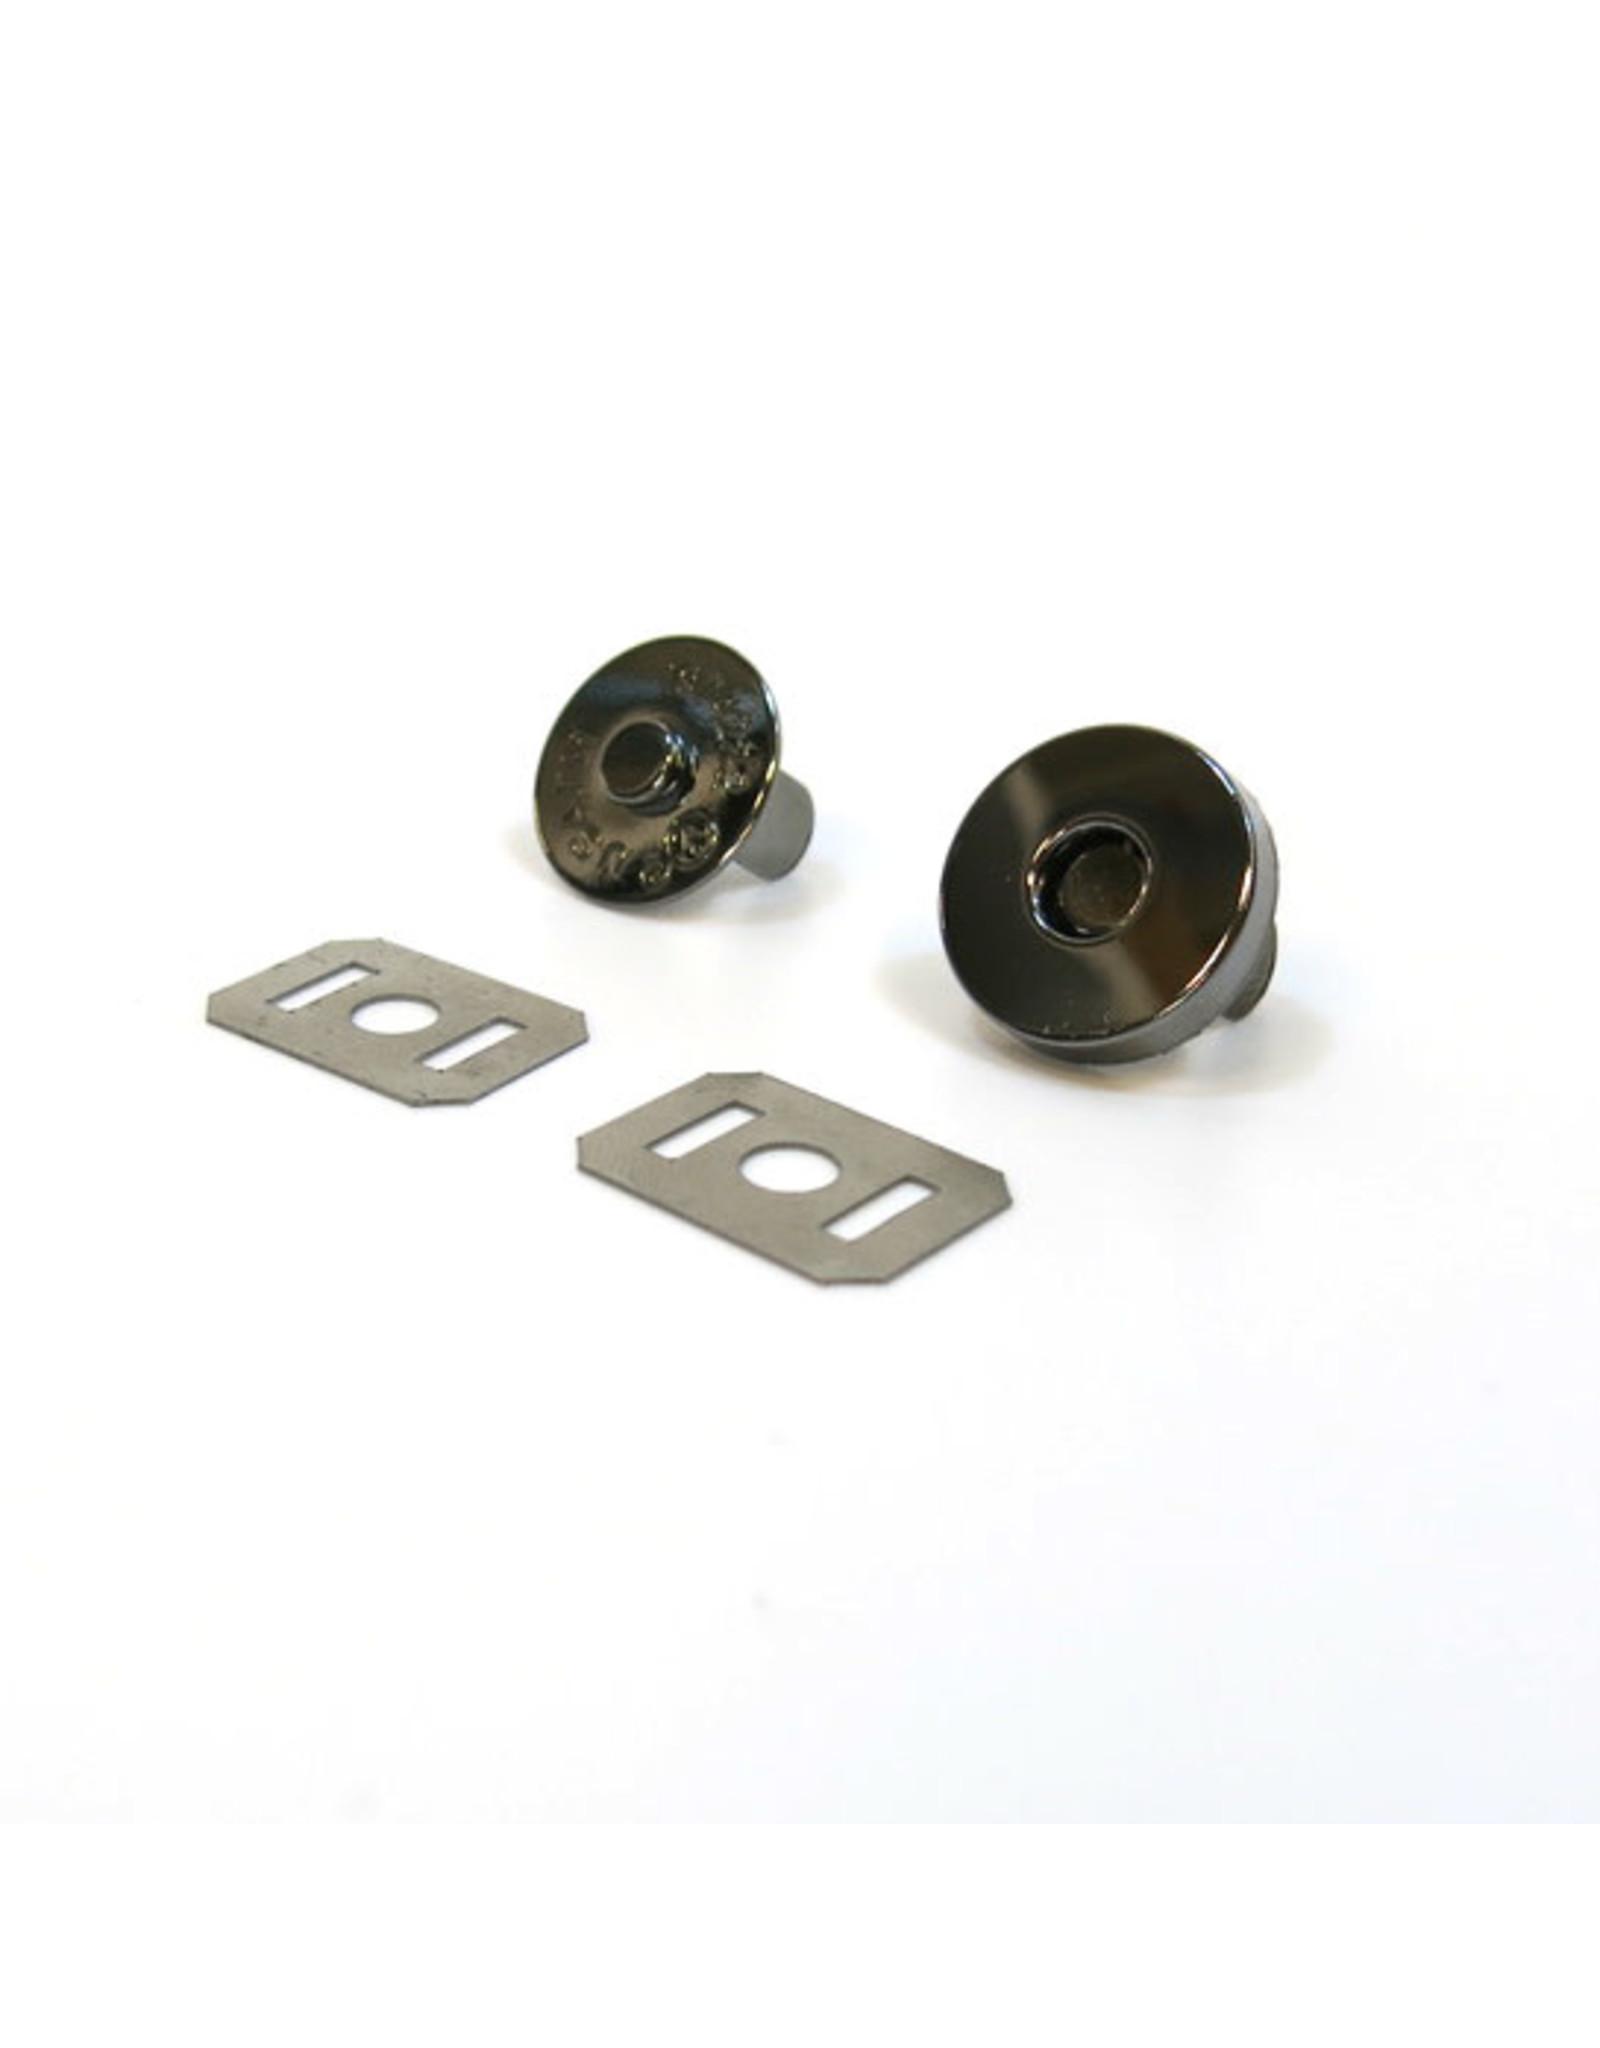 Magneetsluiting 18mm